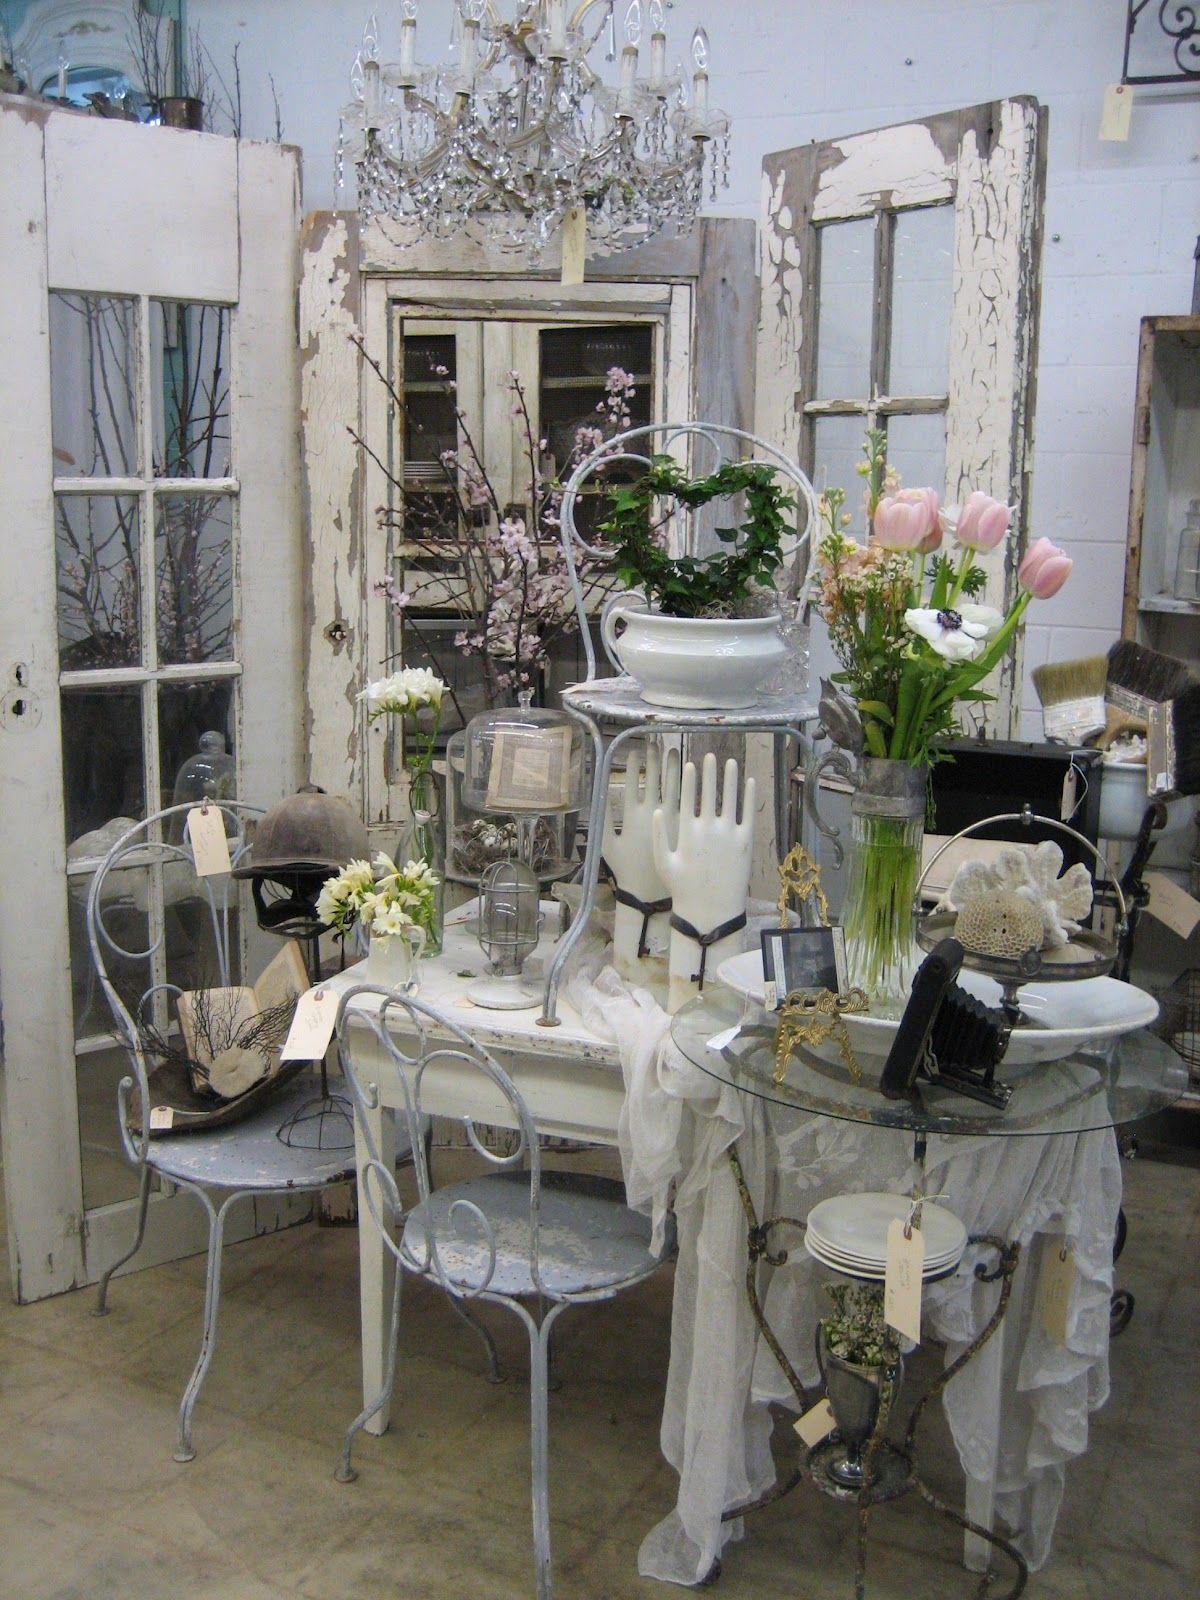 Pin by mary ellen glidden on booth inspiration pinterest shabby m bel dekoration and shabby - Deko wintergarten ...